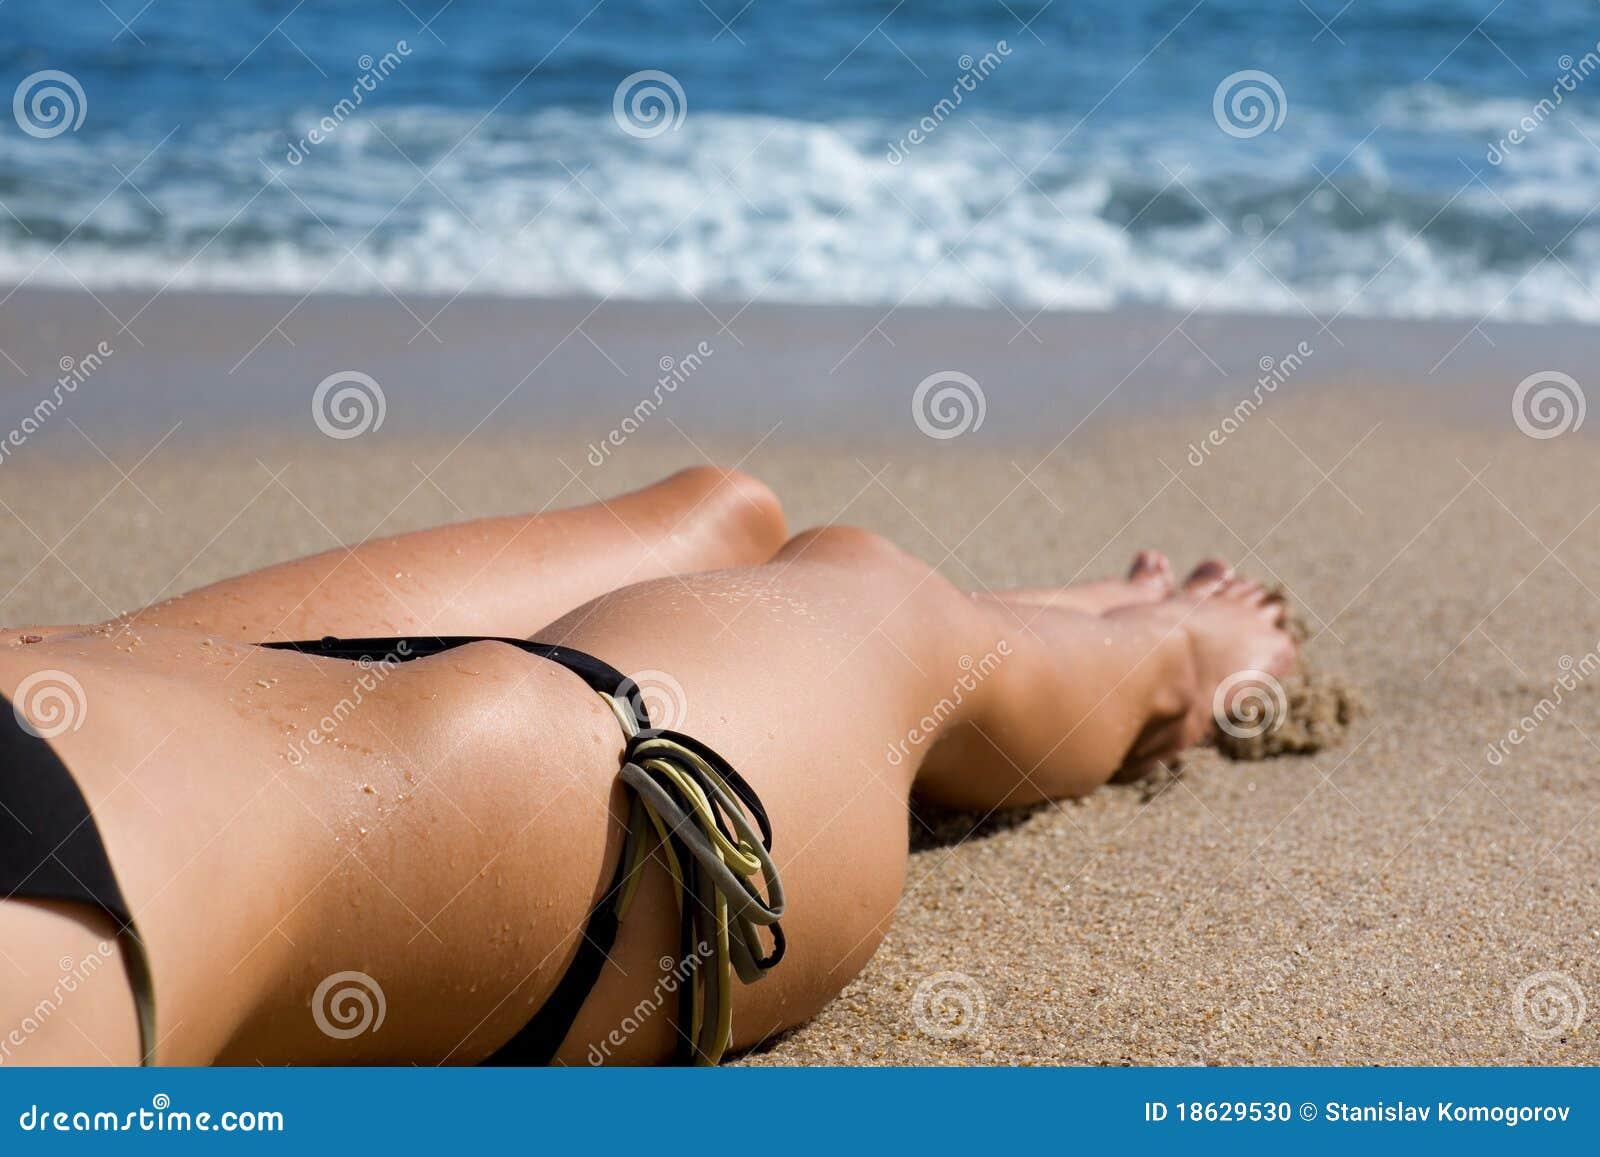 Тела девушек на пляже